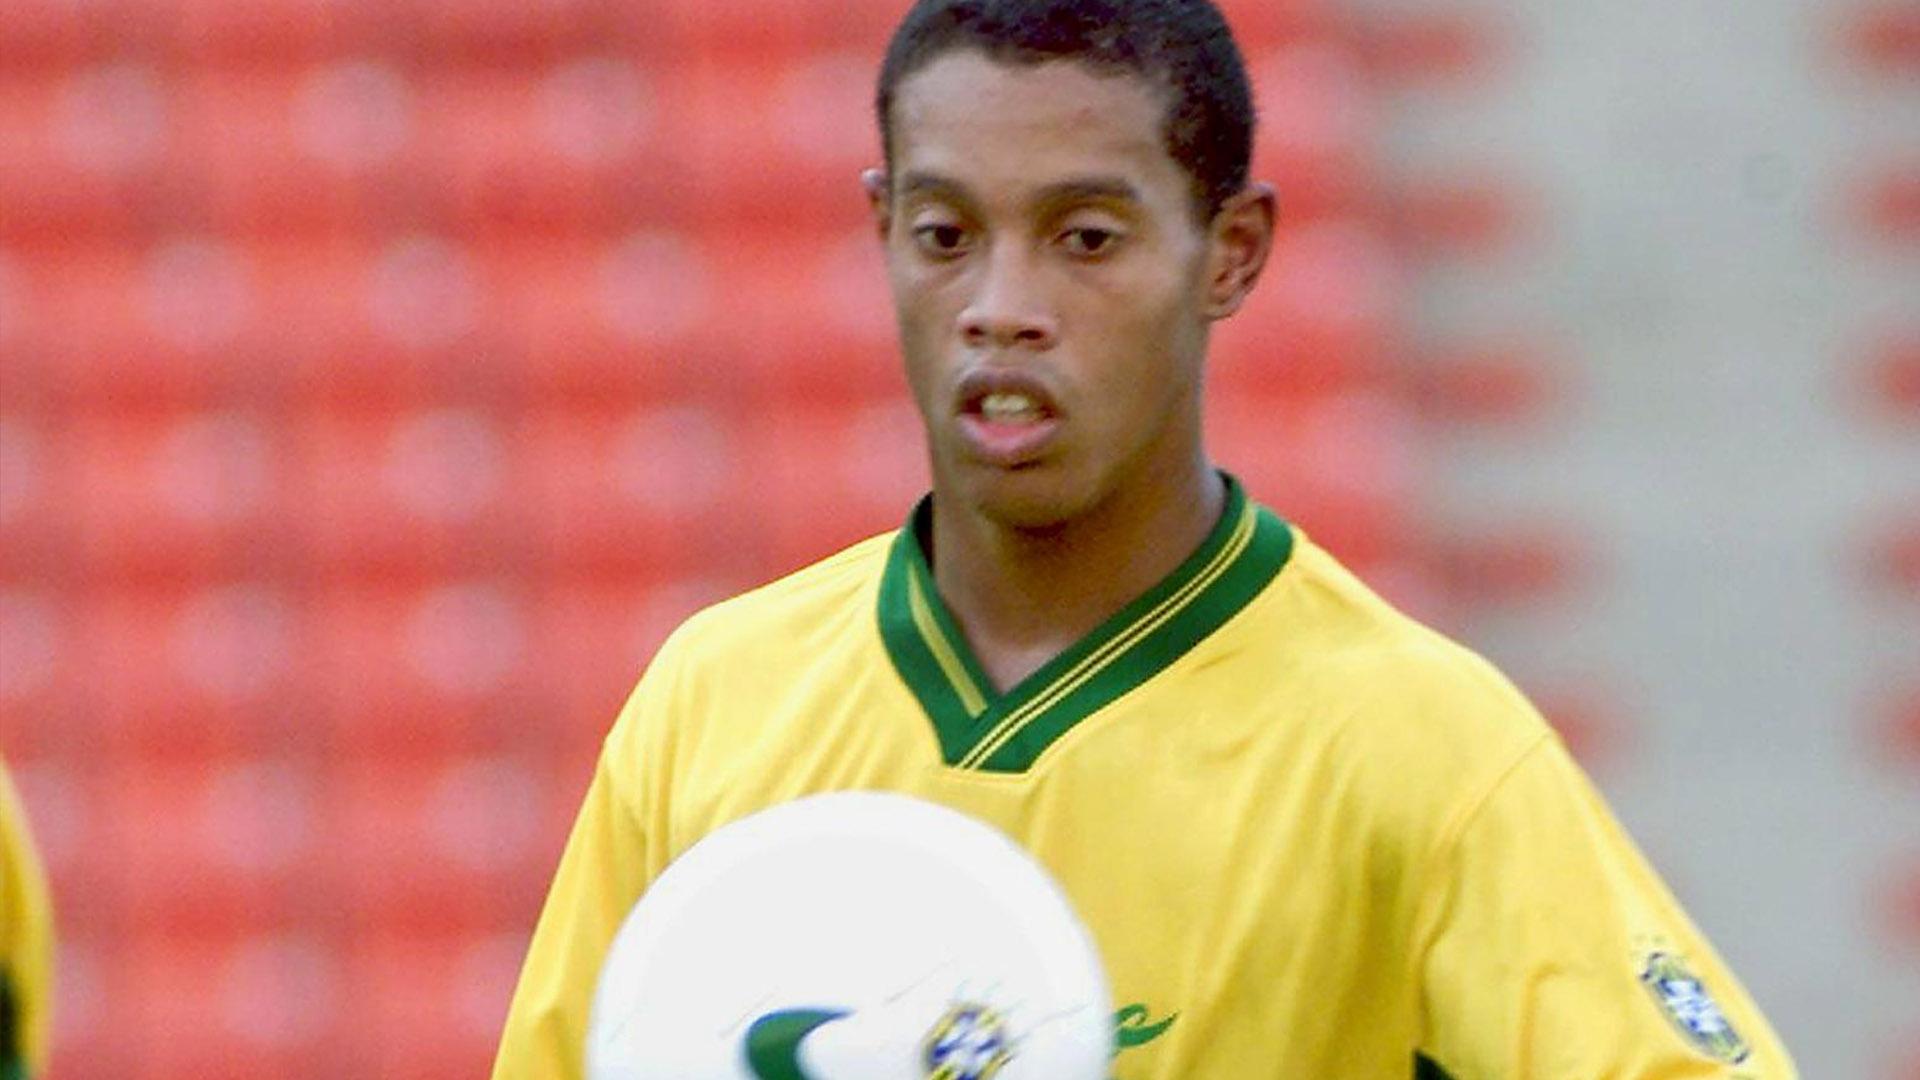 Ronaldinho Golden Ball Confederations Cup Brazil Mexico 1999